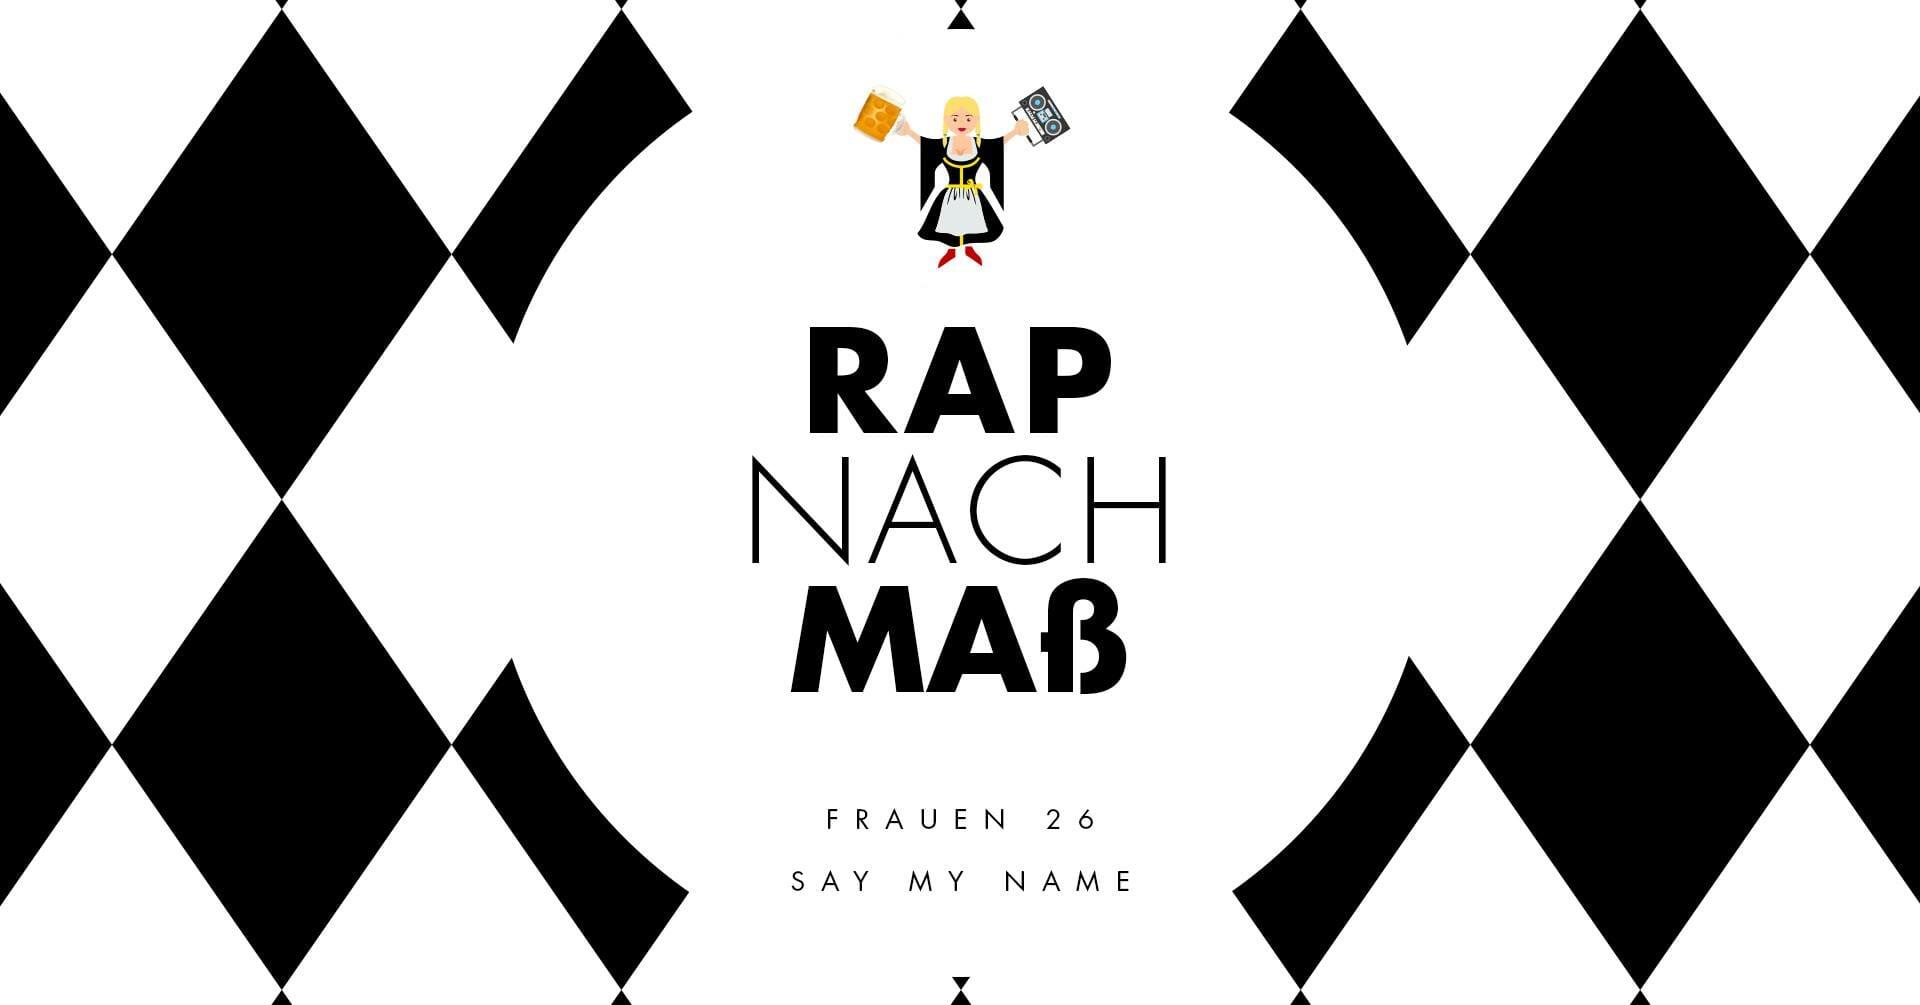 Rap nach Maß in München